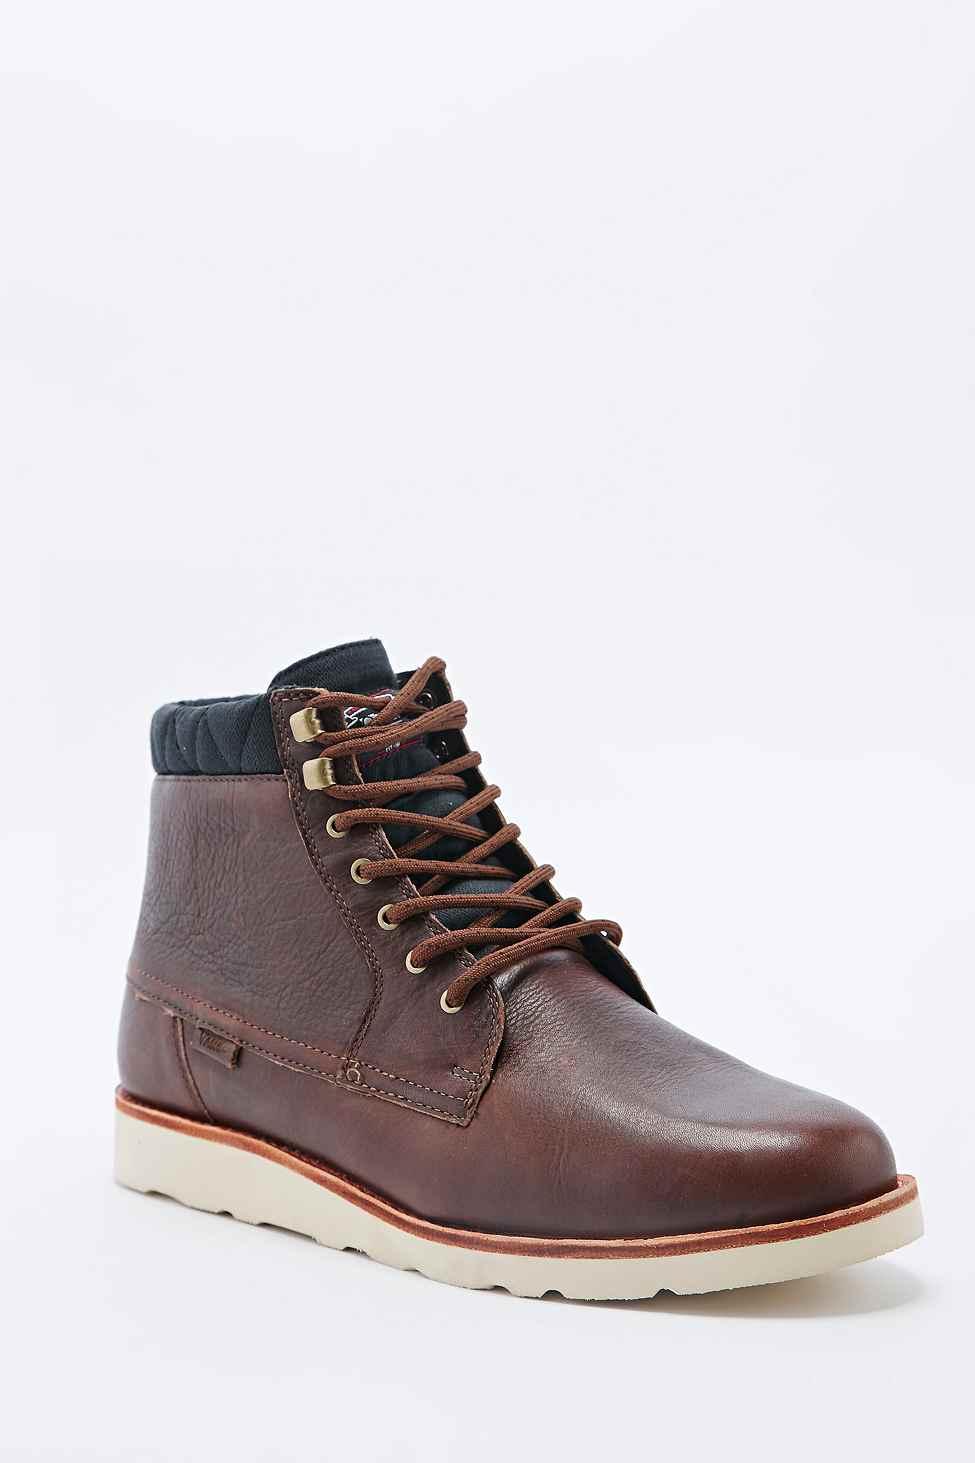 0efb94f461adb8 Vans Breton Leather Boots In Brown in Brown for Men - Lyst